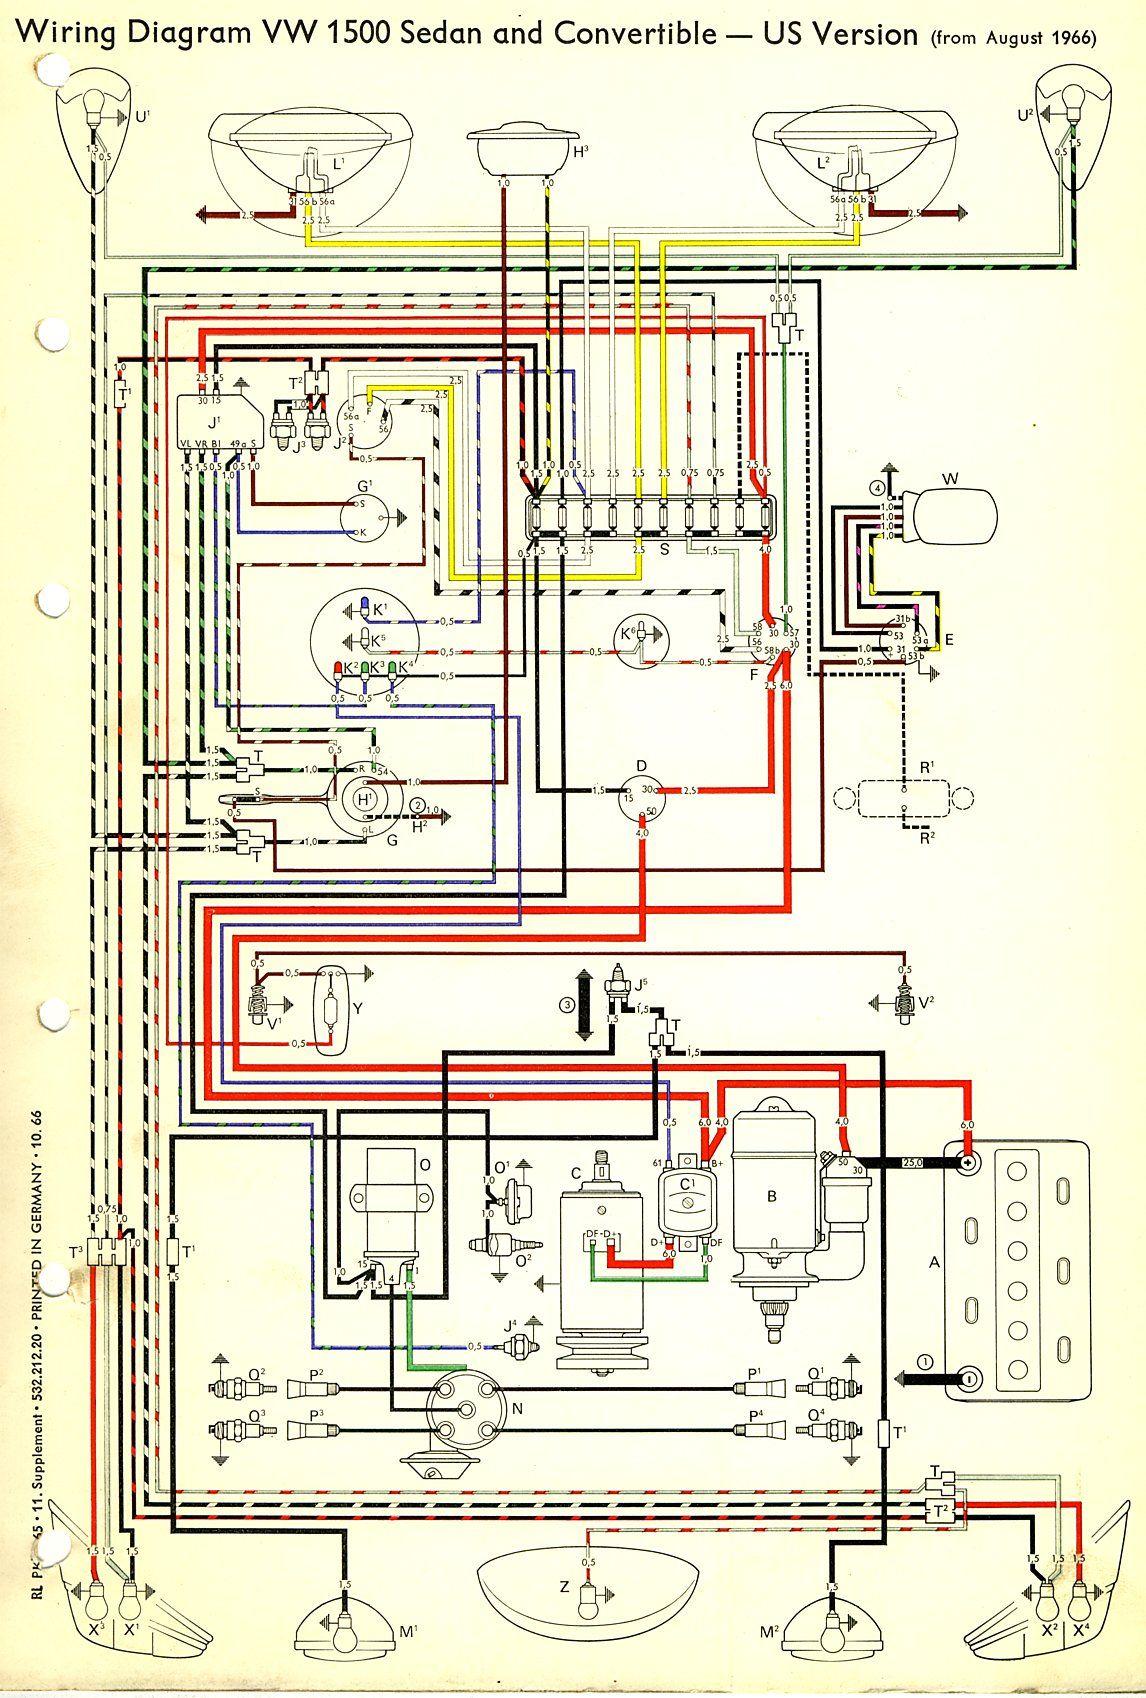 1967 Beetle Wiring Diagram (USA) | TheGoldenBug | best